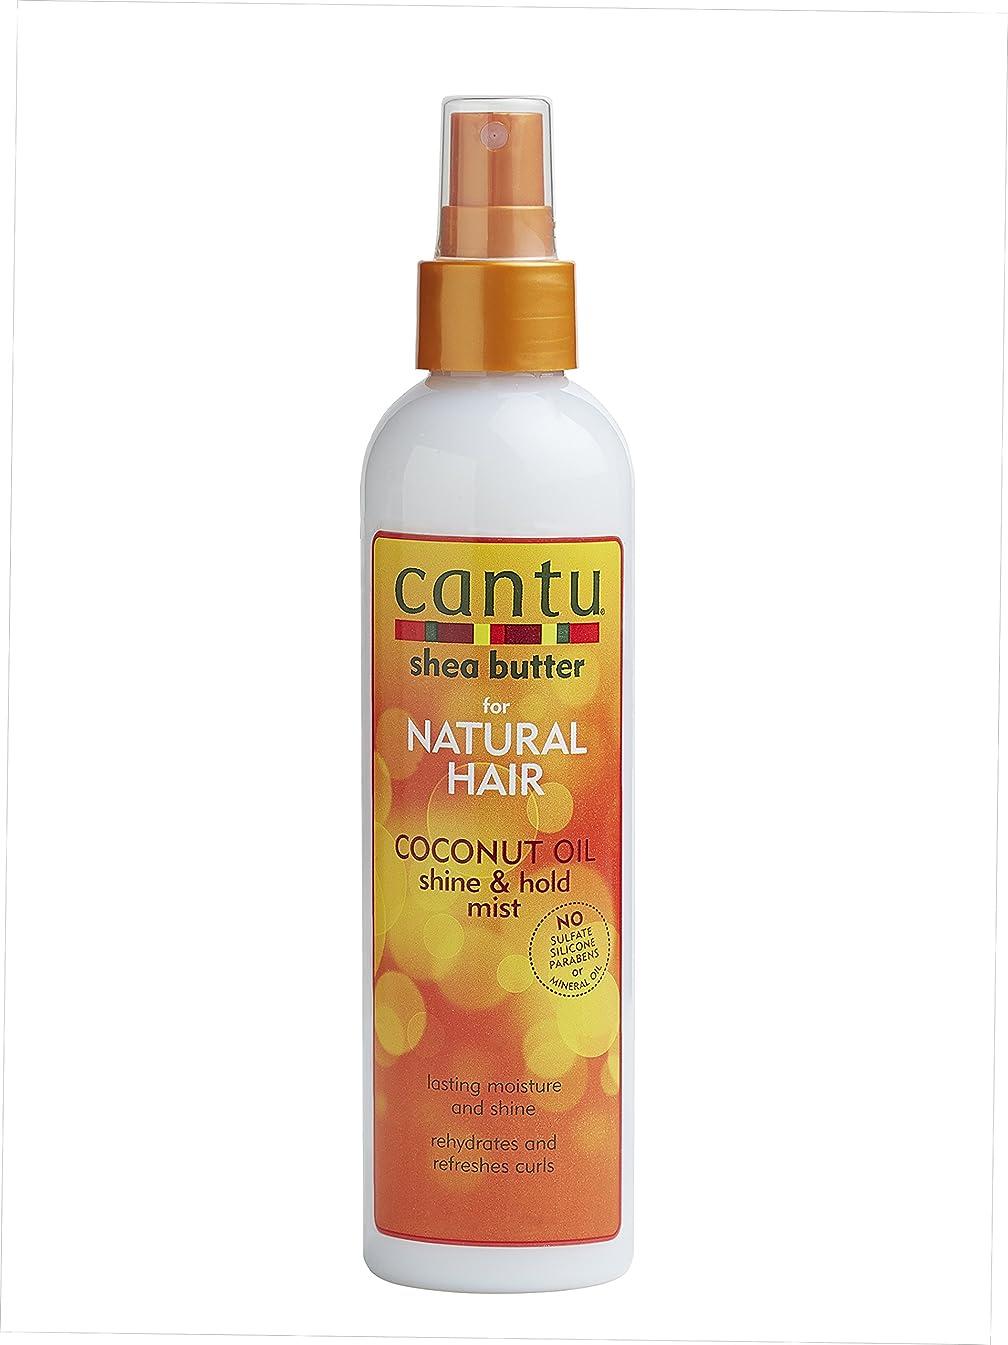 Cantu Shea Butter Coconut Oil Shine and Hold Mist, 8 Fluid Ounce